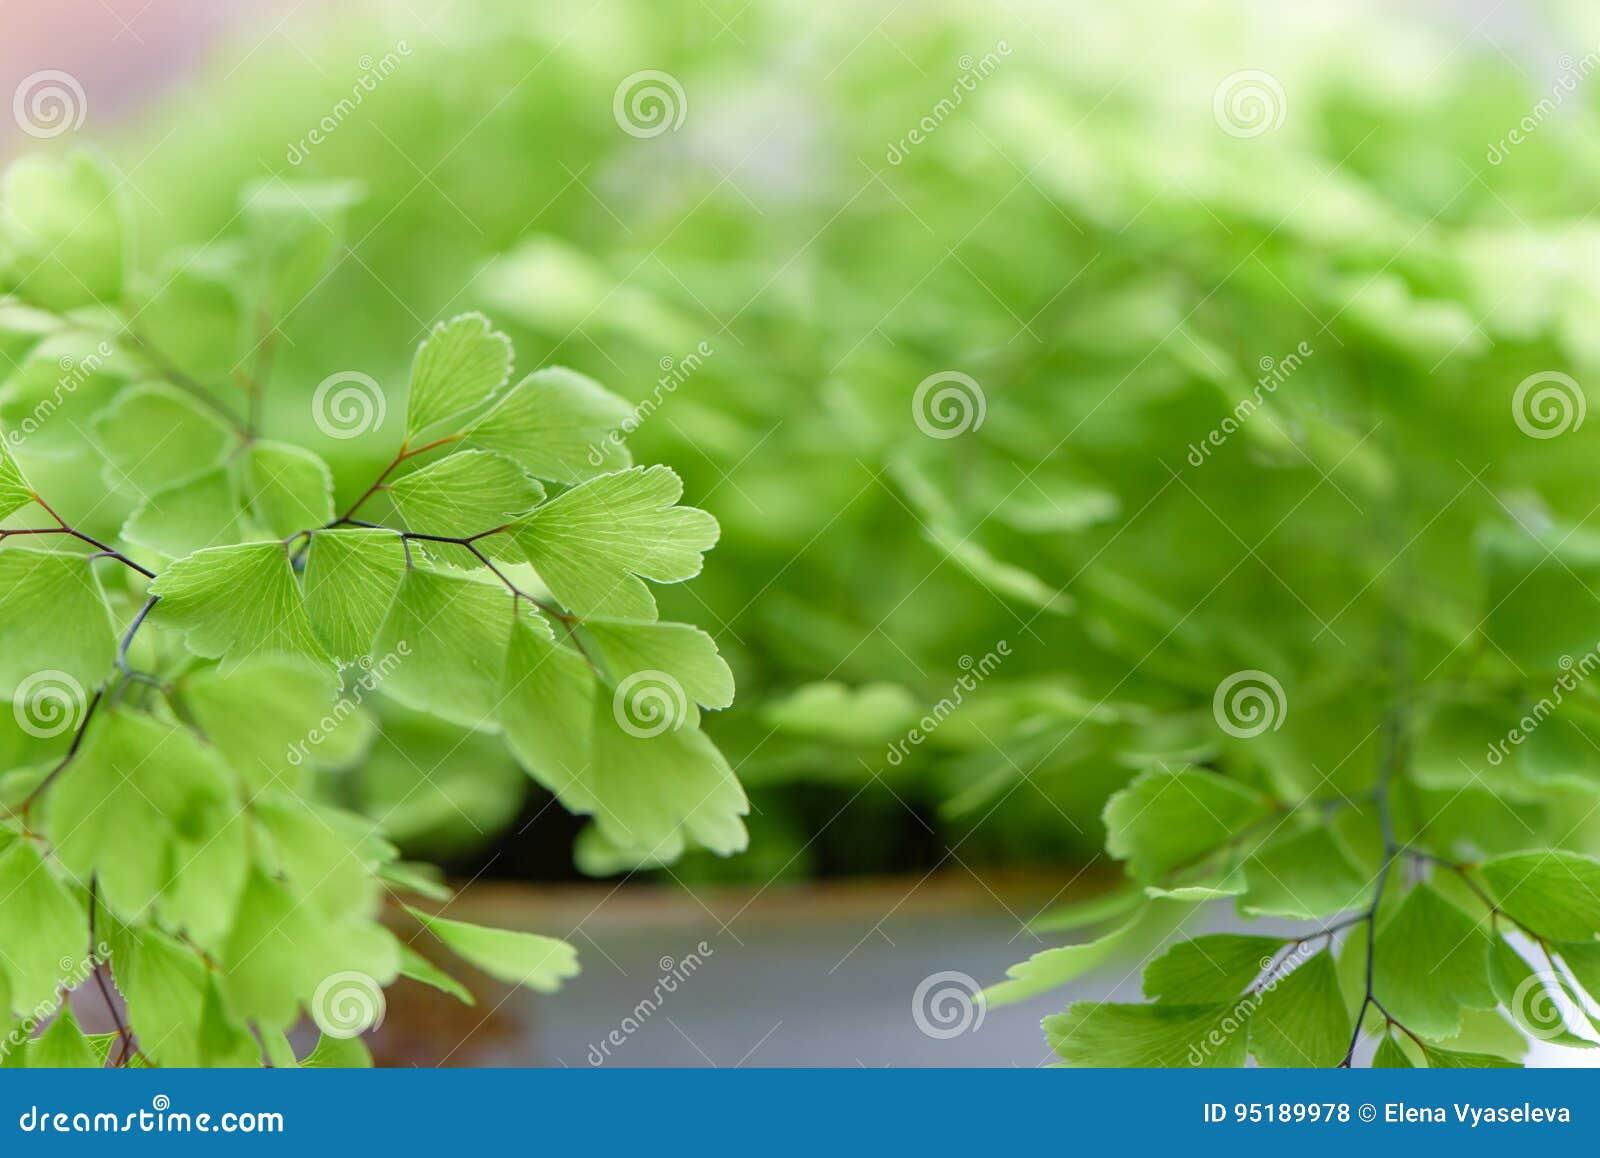 Macro of adiantum philippense or maidenhair fern growing in a